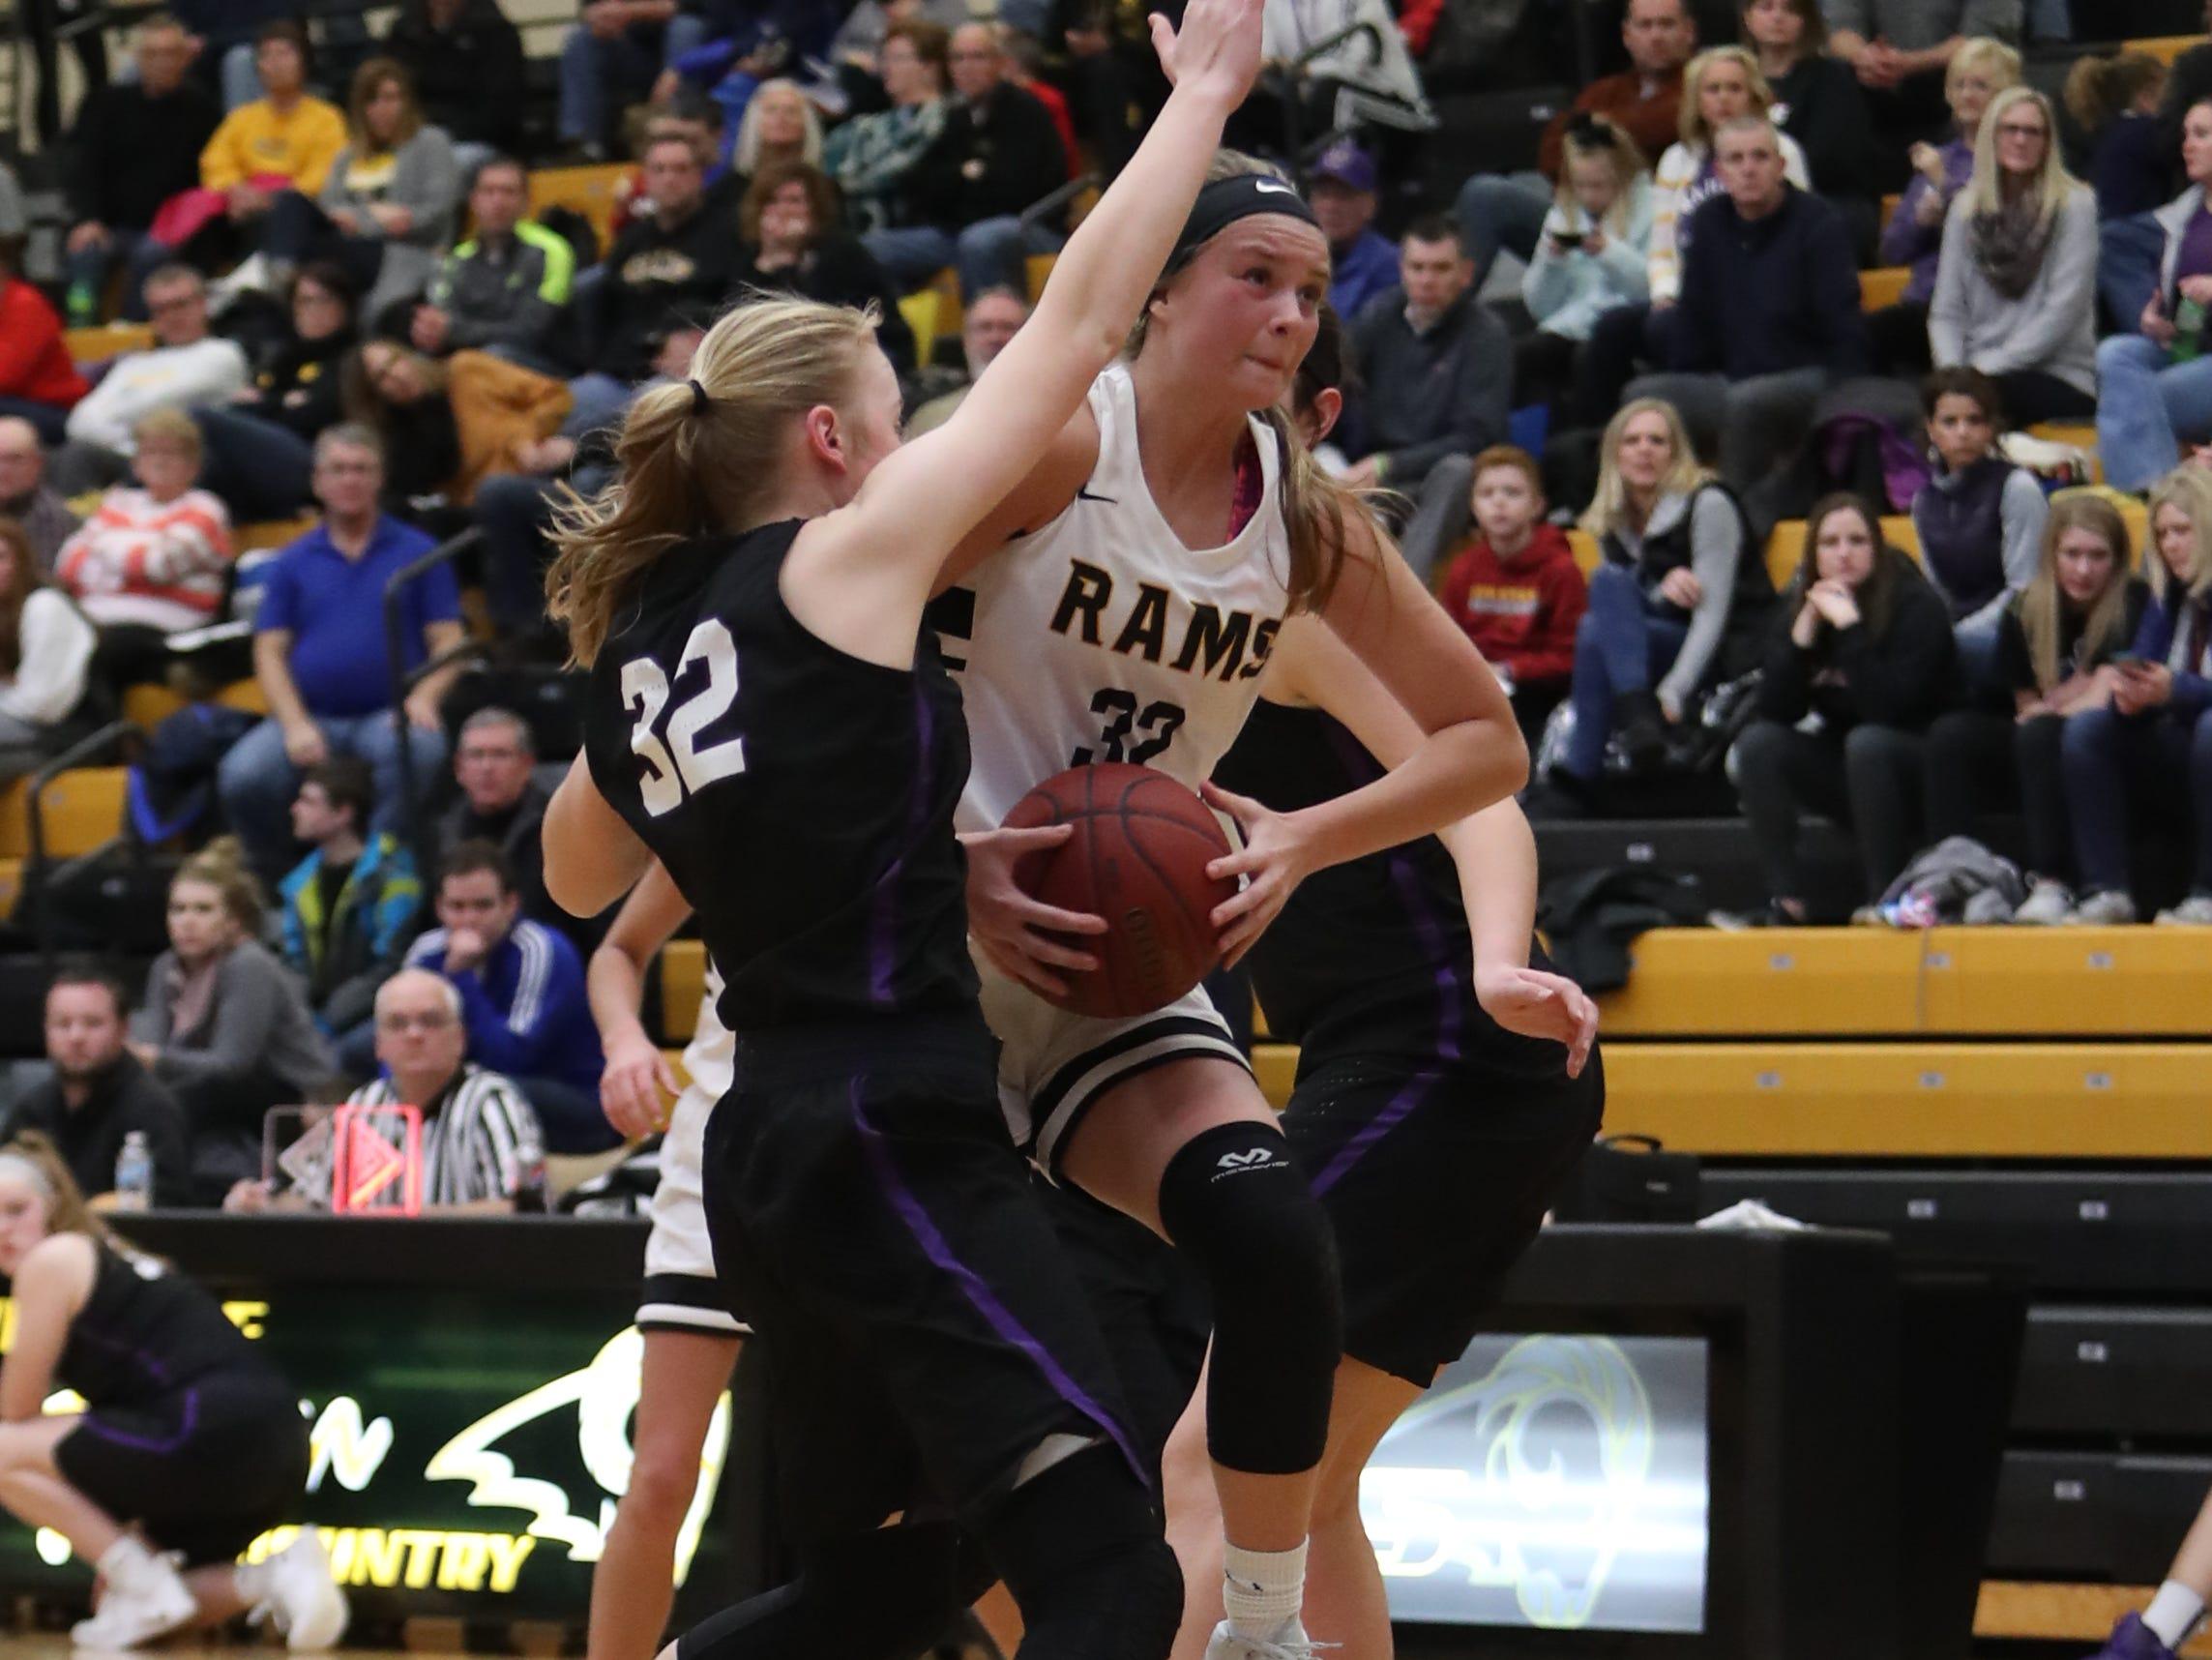 Waukee Warriors' Reagan Bartholomew (32) defends Southeast Polk Rams' Maggie McGraw (32) during a game Feb. 1, 2019 at Southeast Polk High School. The Warriors beat the Rams 66 to 43.